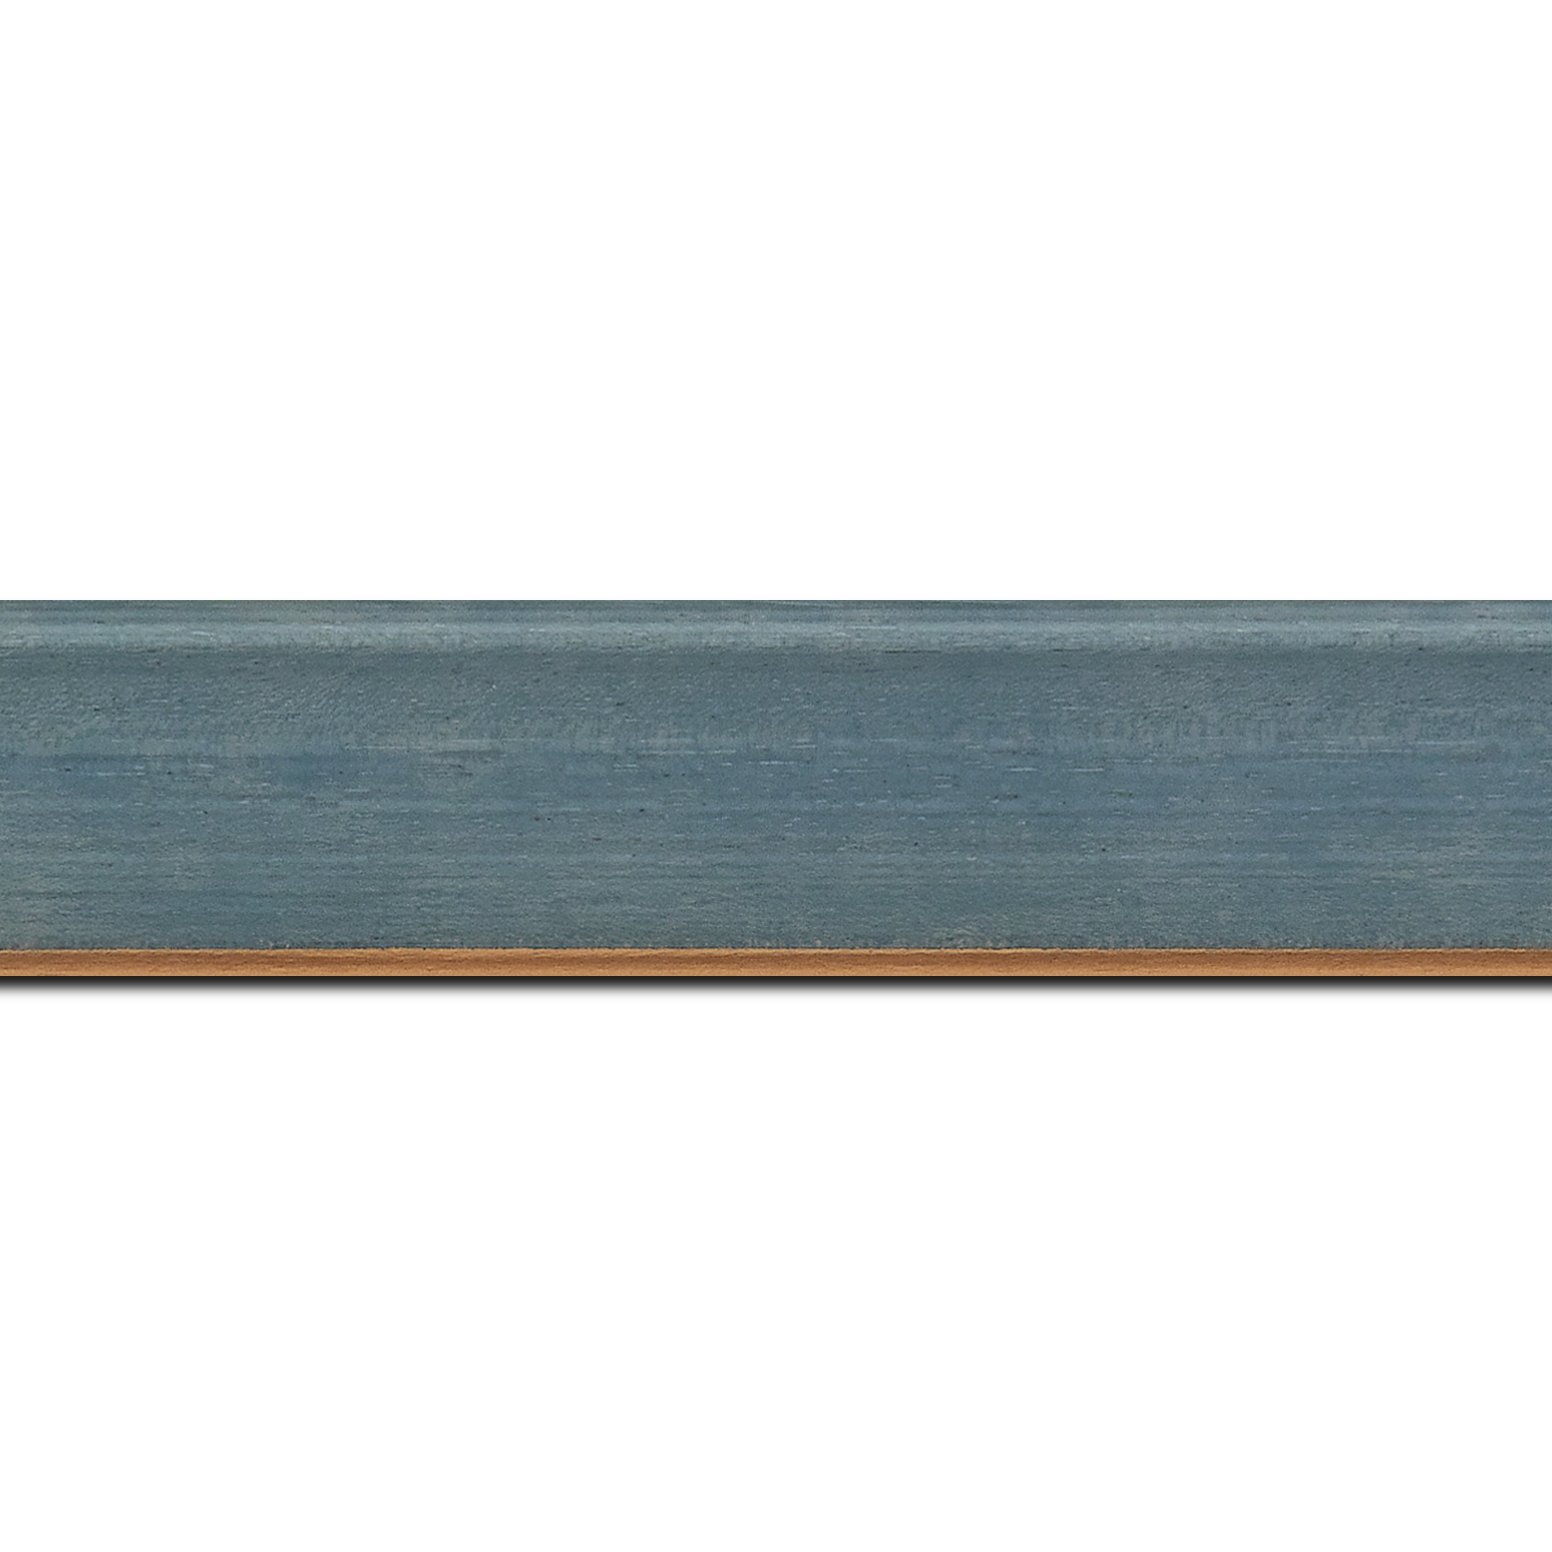 cadre bleu ou bleu turquoise 50x70 pas cher cadre photo bleu ou bleu turquoise 50x70 destock. Black Bedroom Furniture Sets. Home Design Ideas